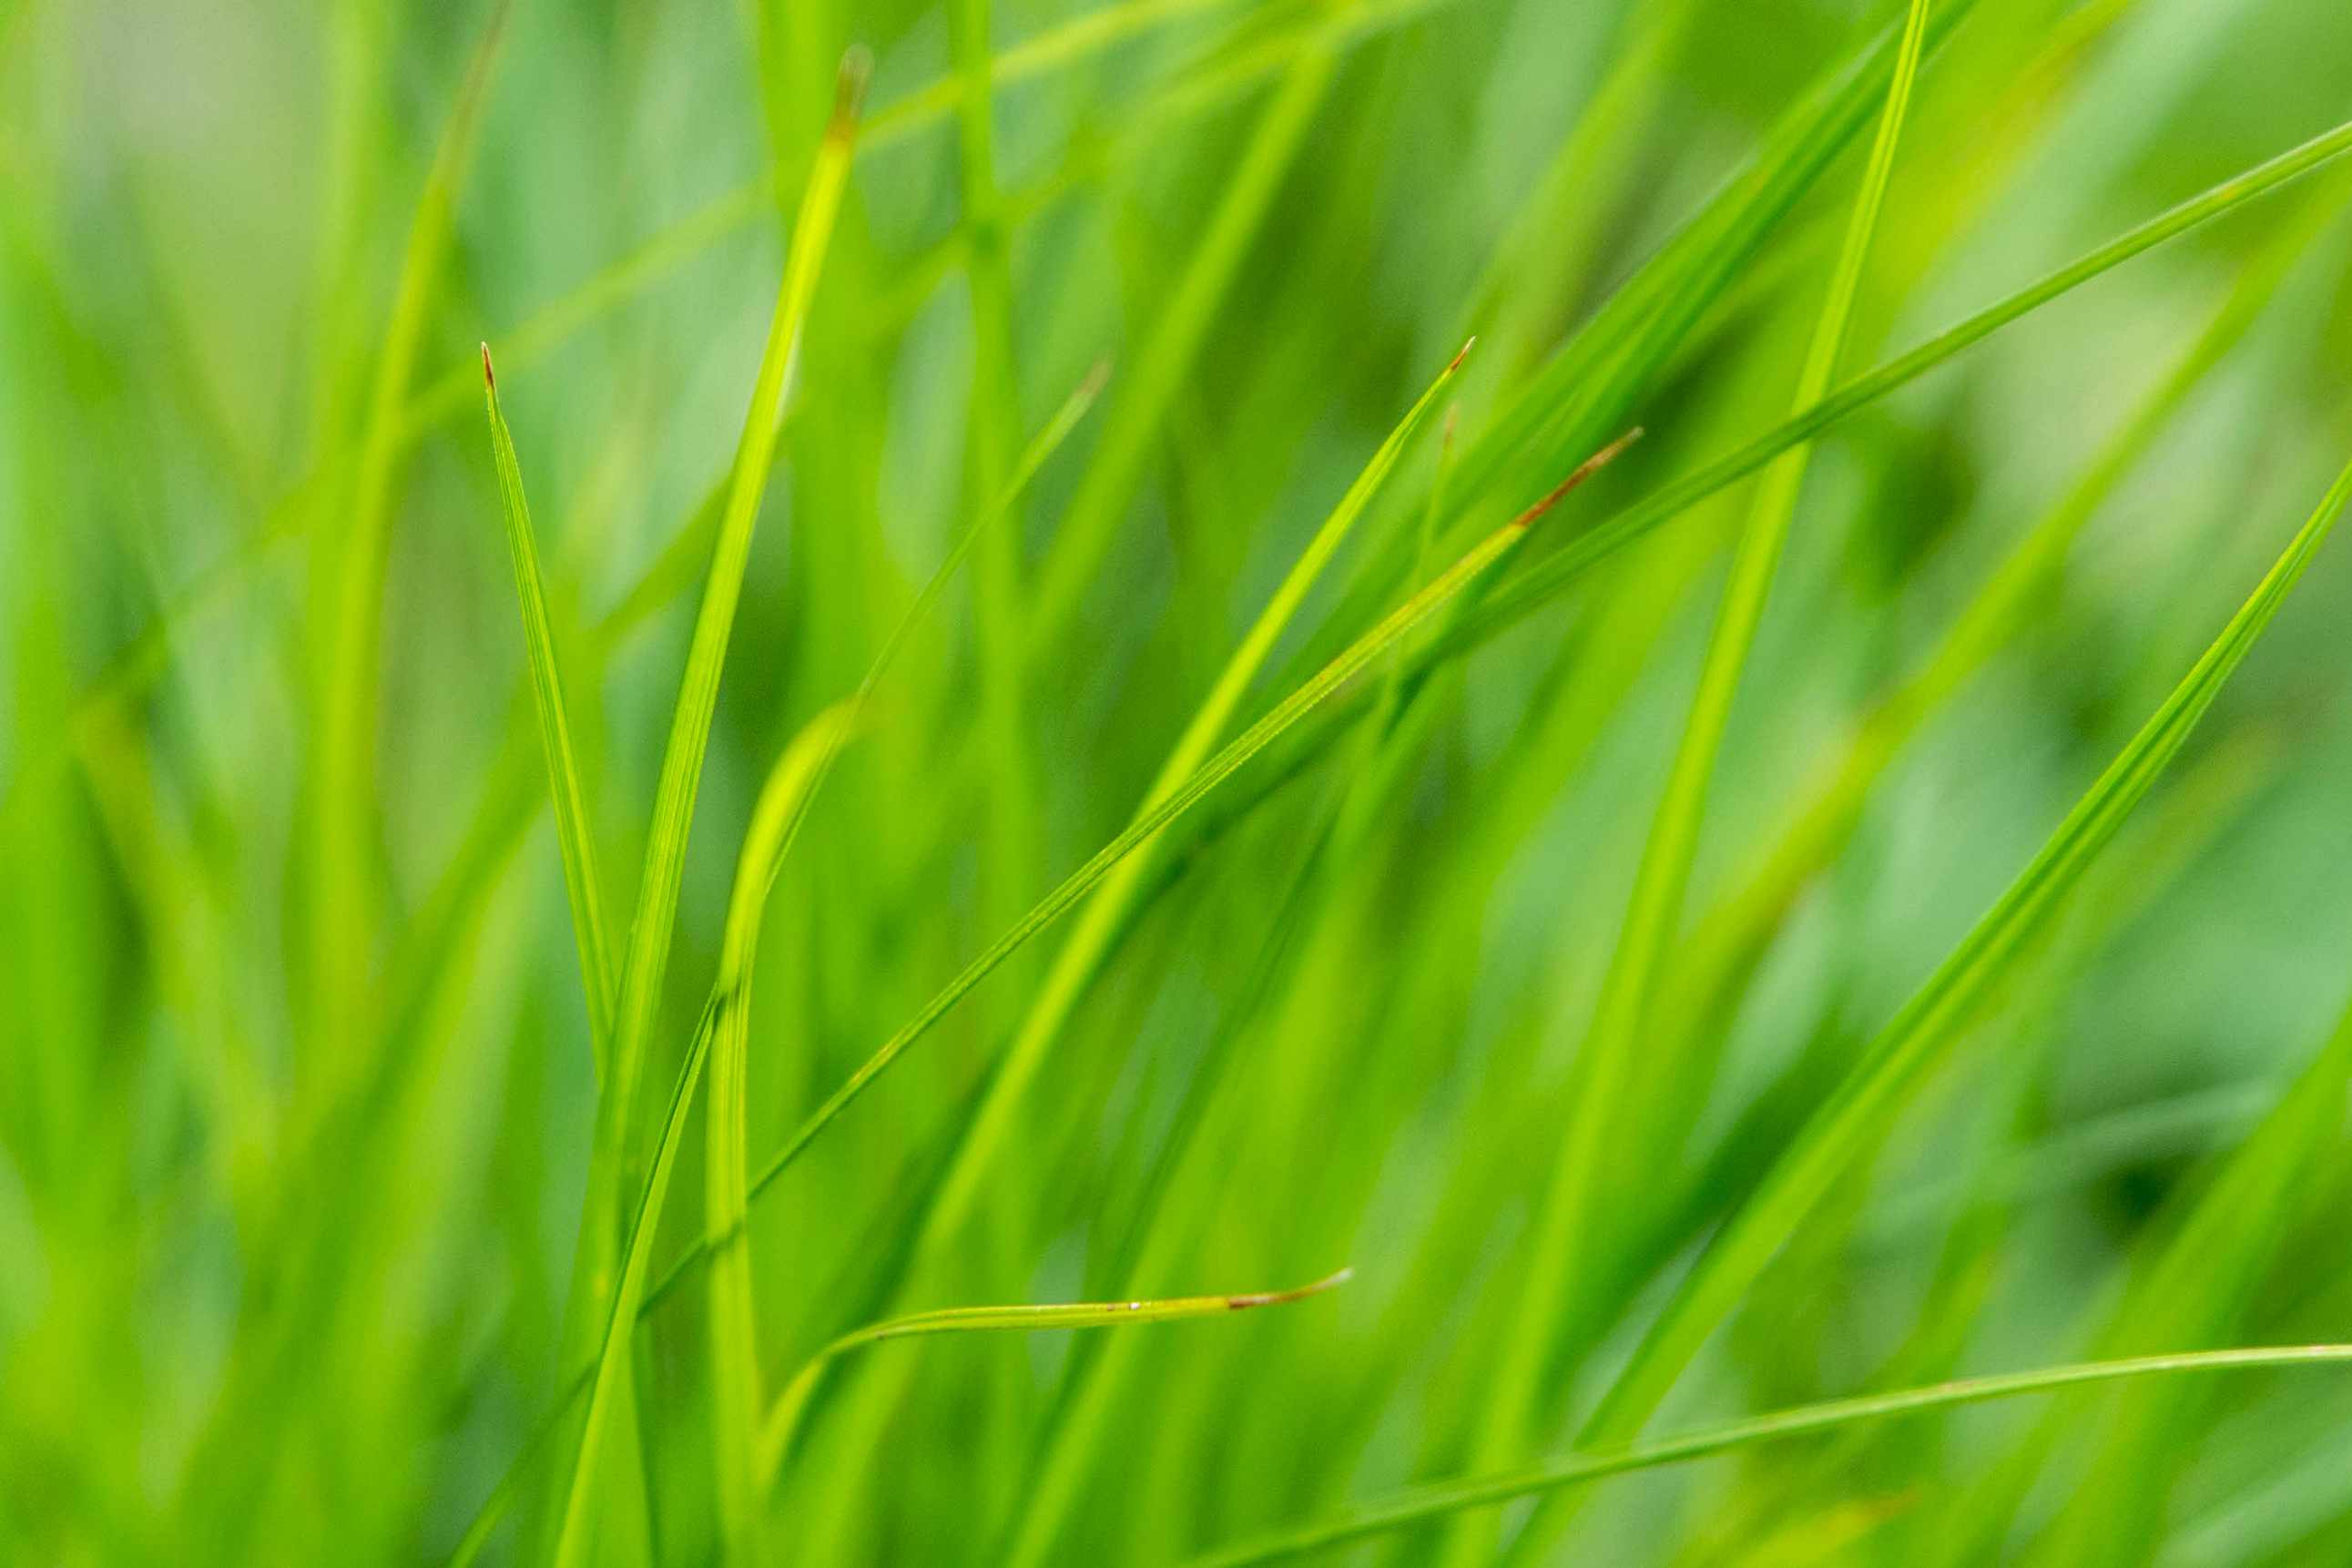 Tussock sedge thin grass-like leaf blades closeup